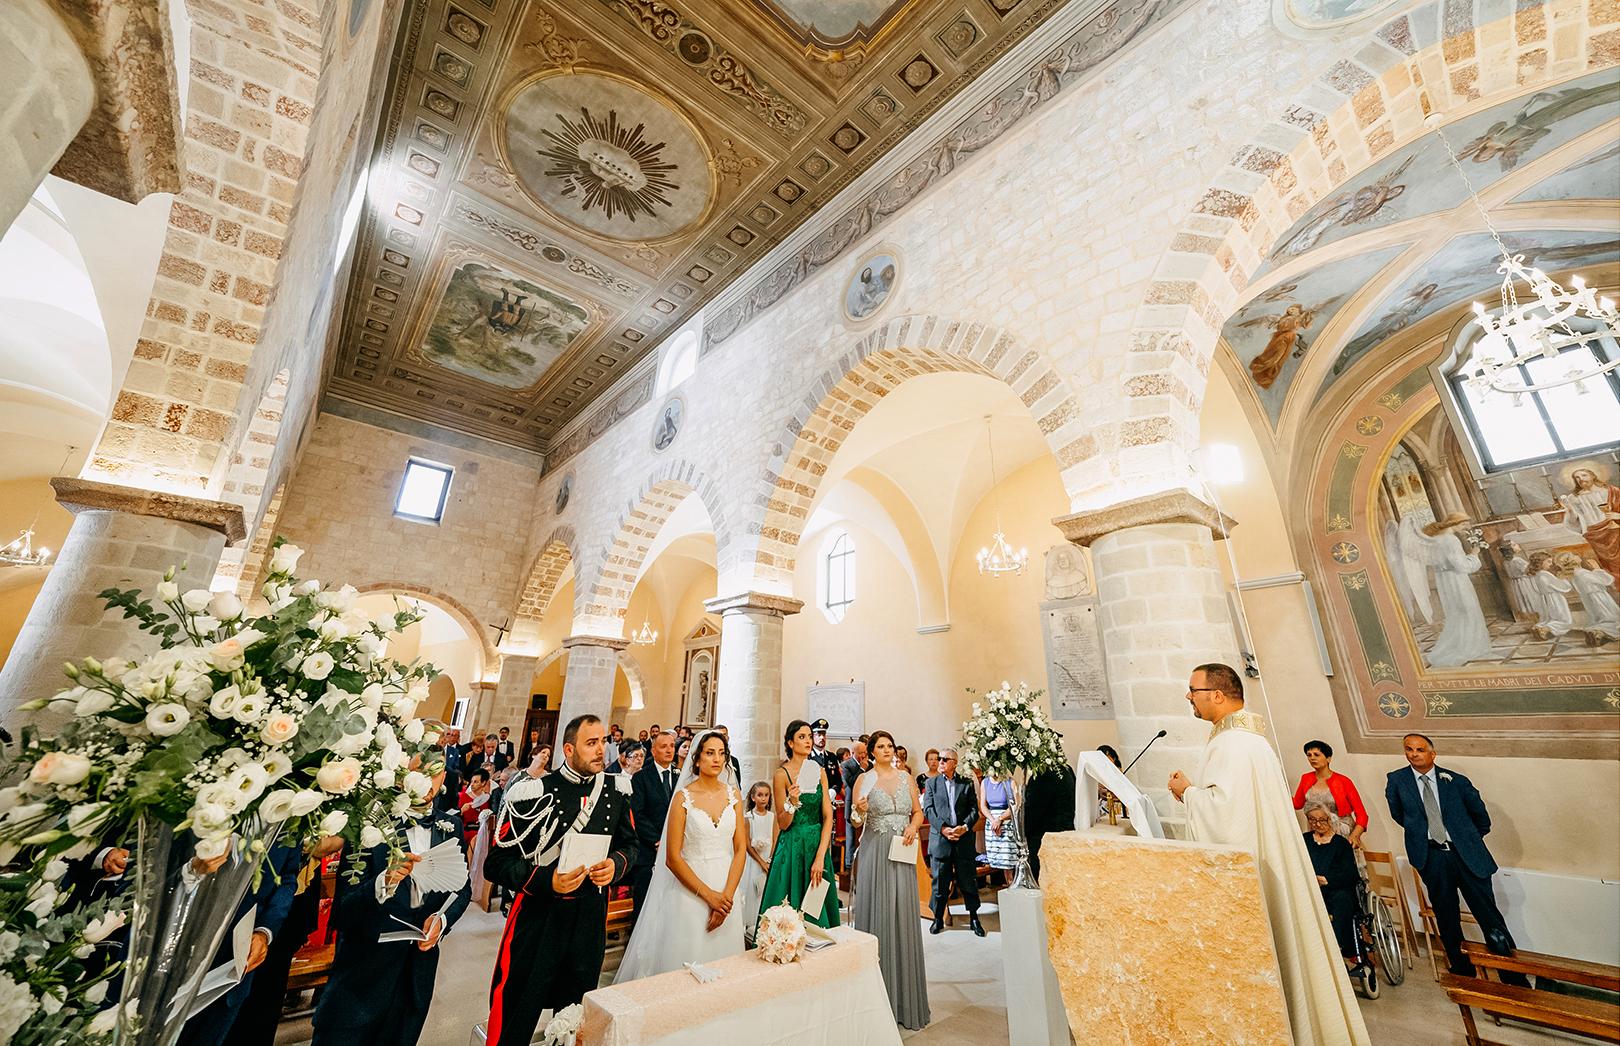 15 gianni-lepore-chiesa-rignano-matrimonio